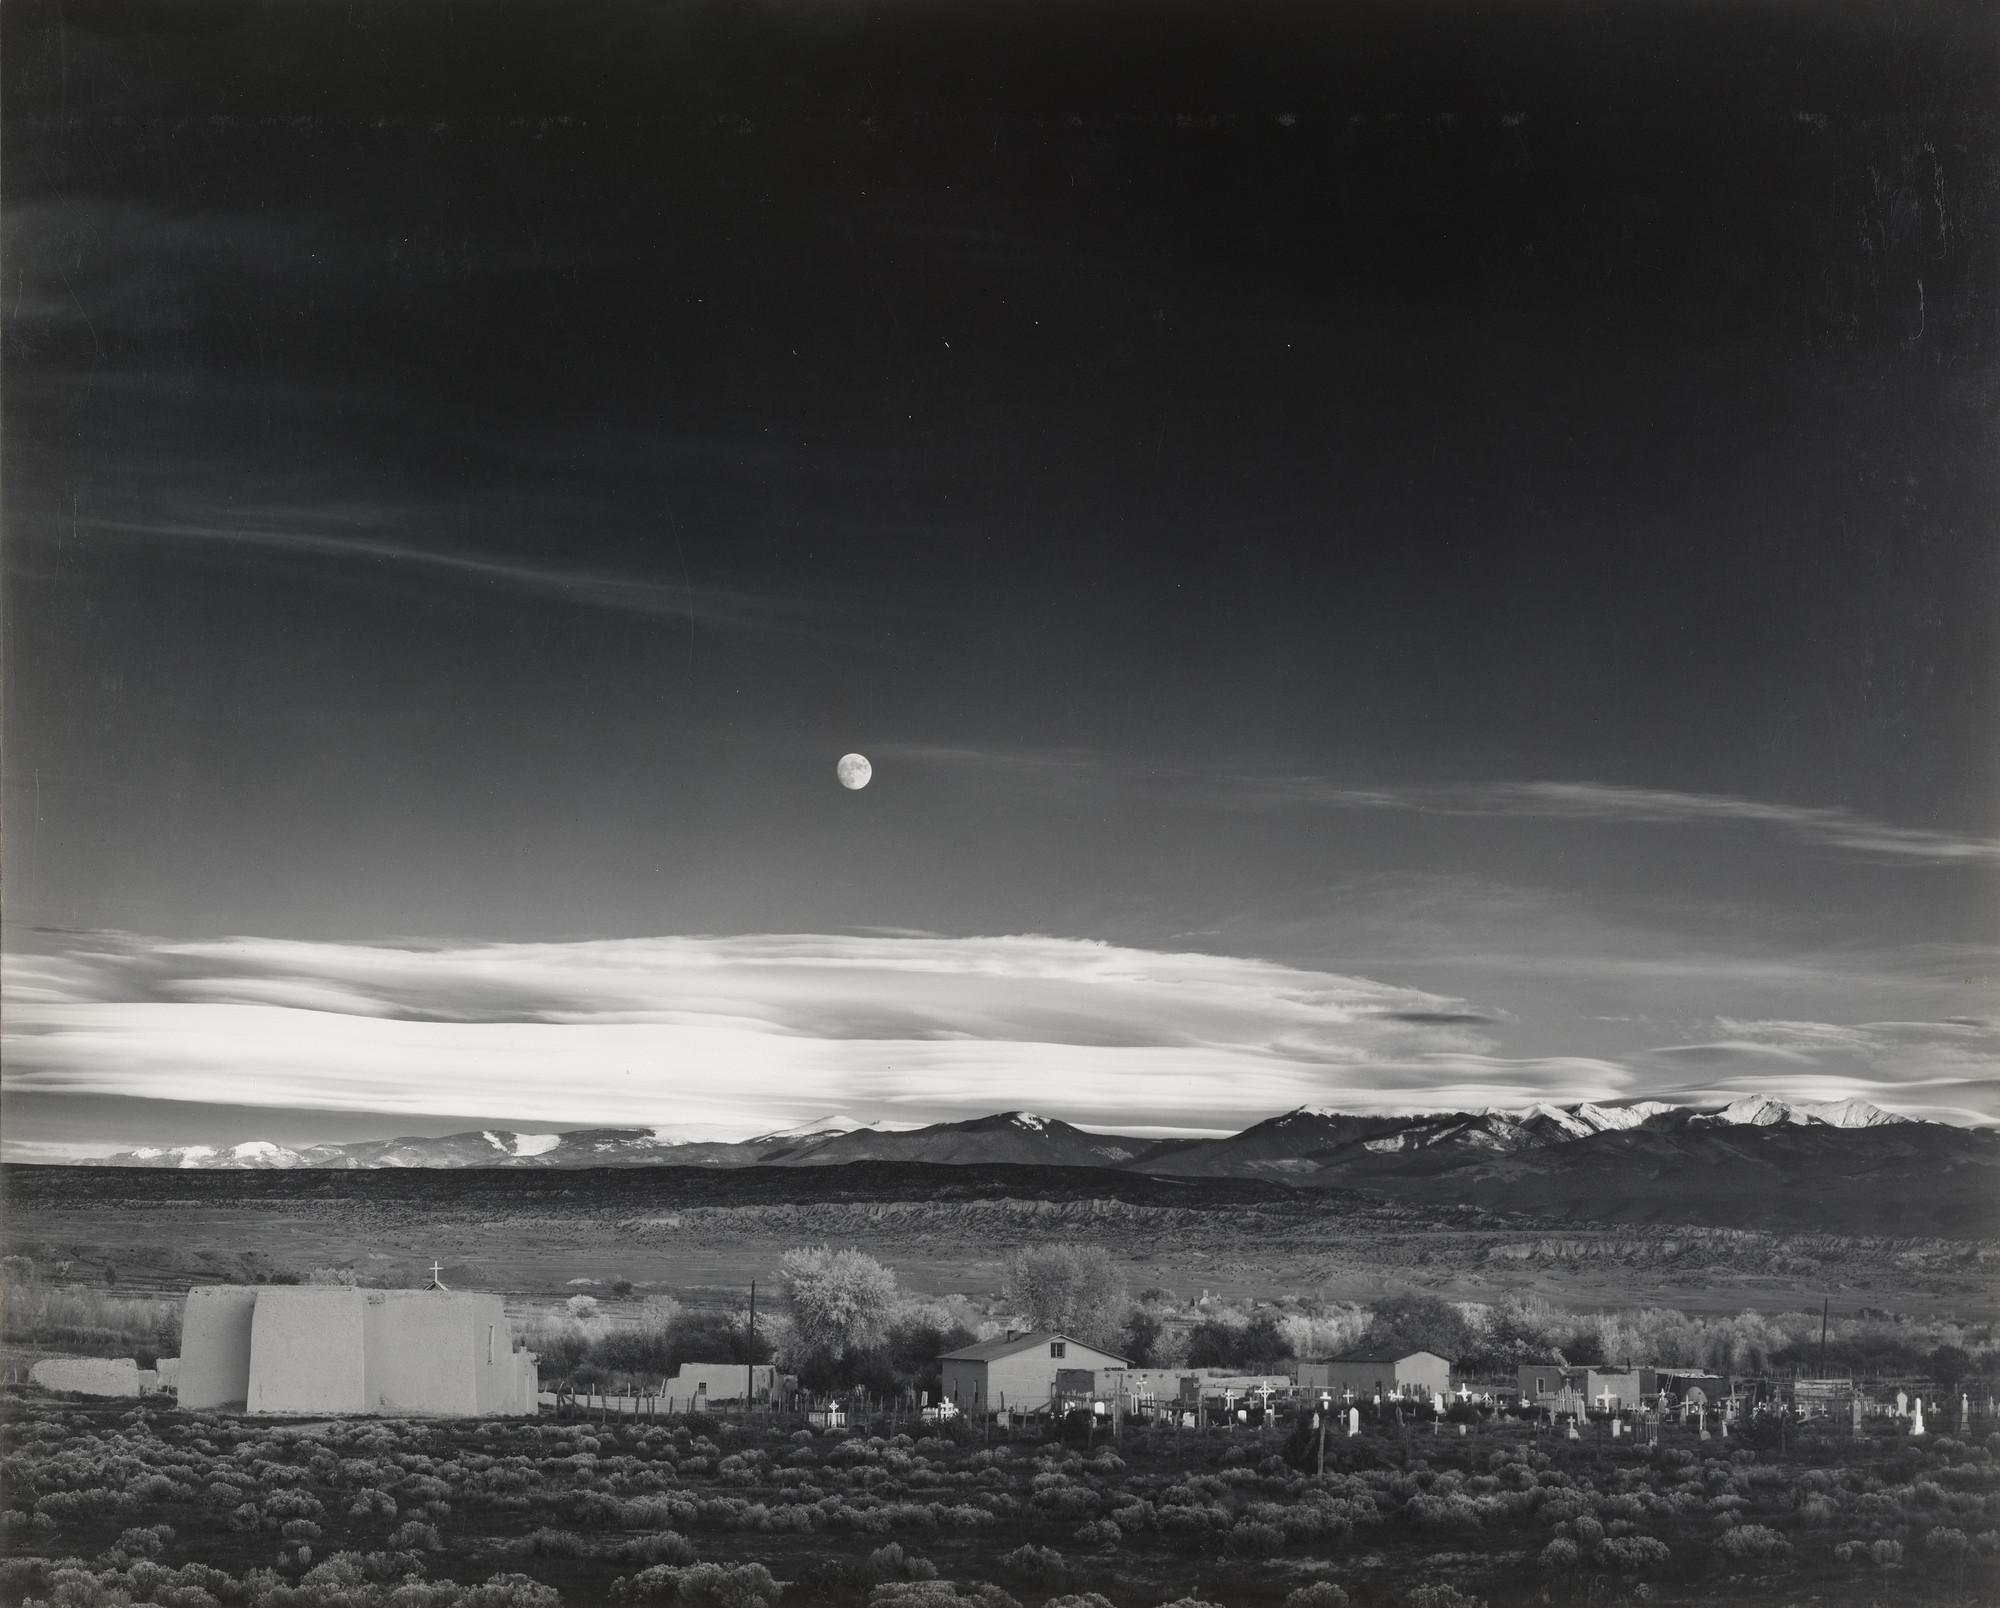 Ansel Adams Moonrise Hernandez New Mexico 1941 Moma